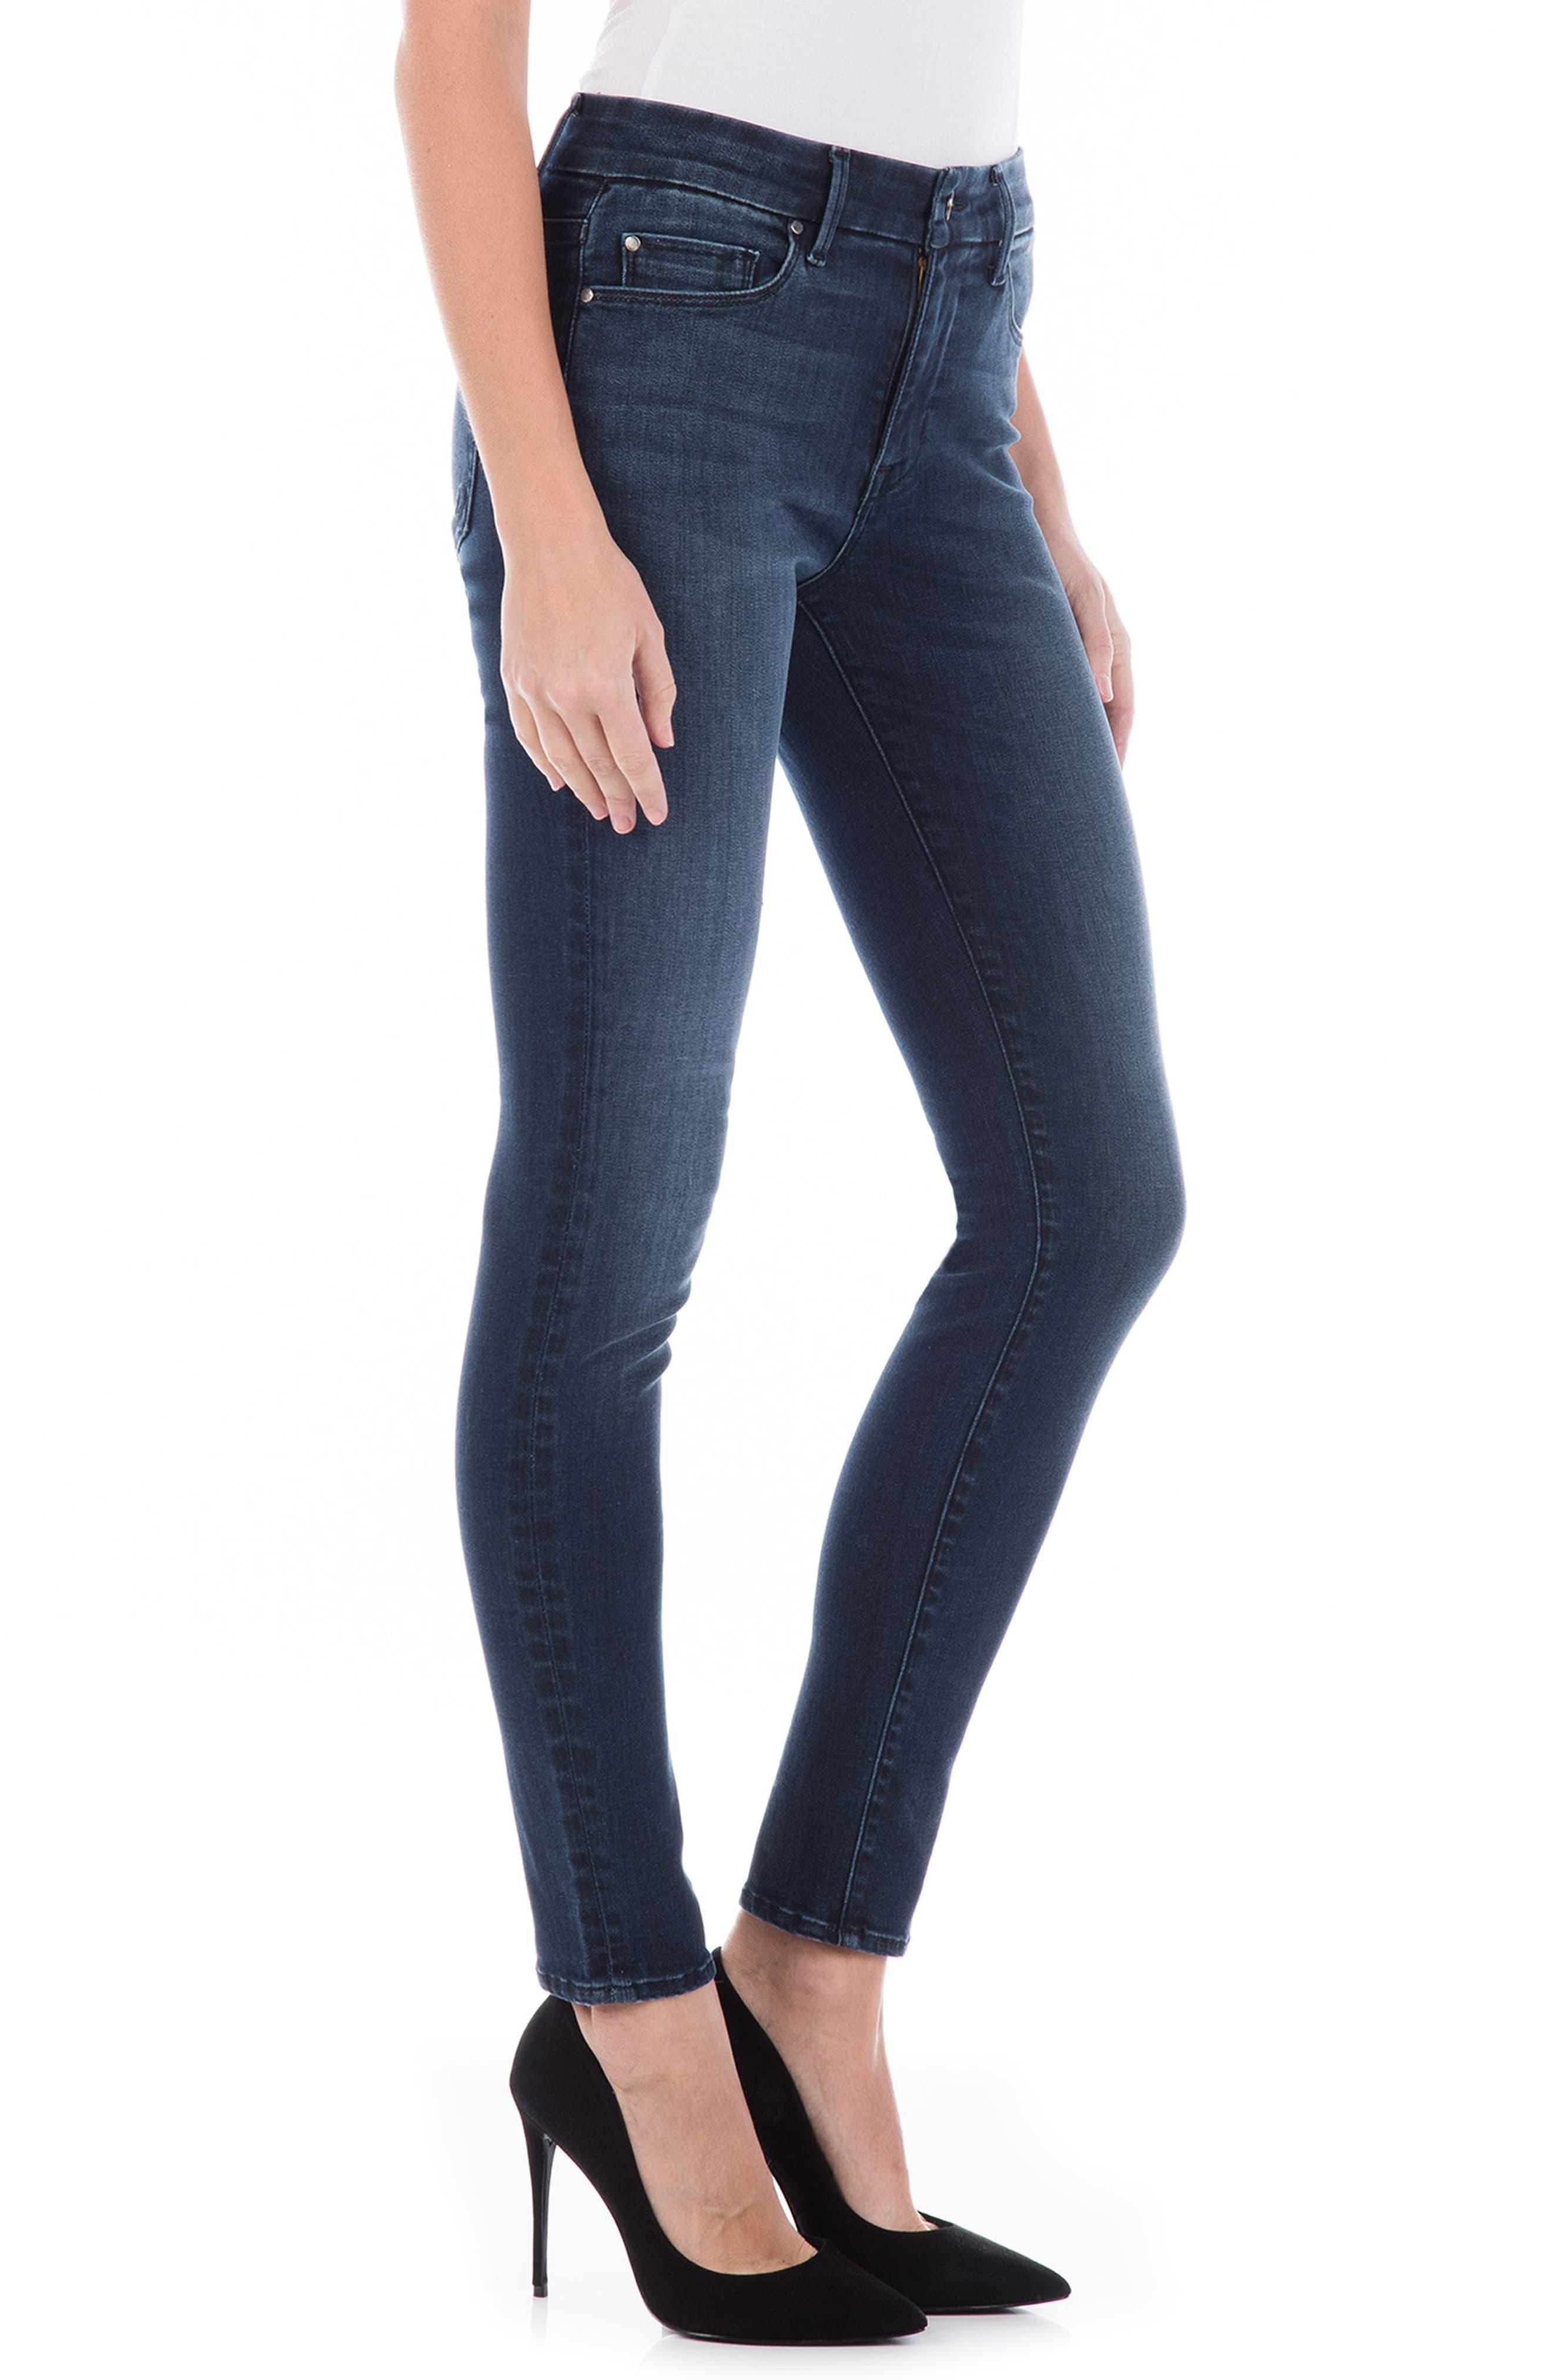 Sola Skinny Jeans,                             Alternate thumbnail 3, color,                             400